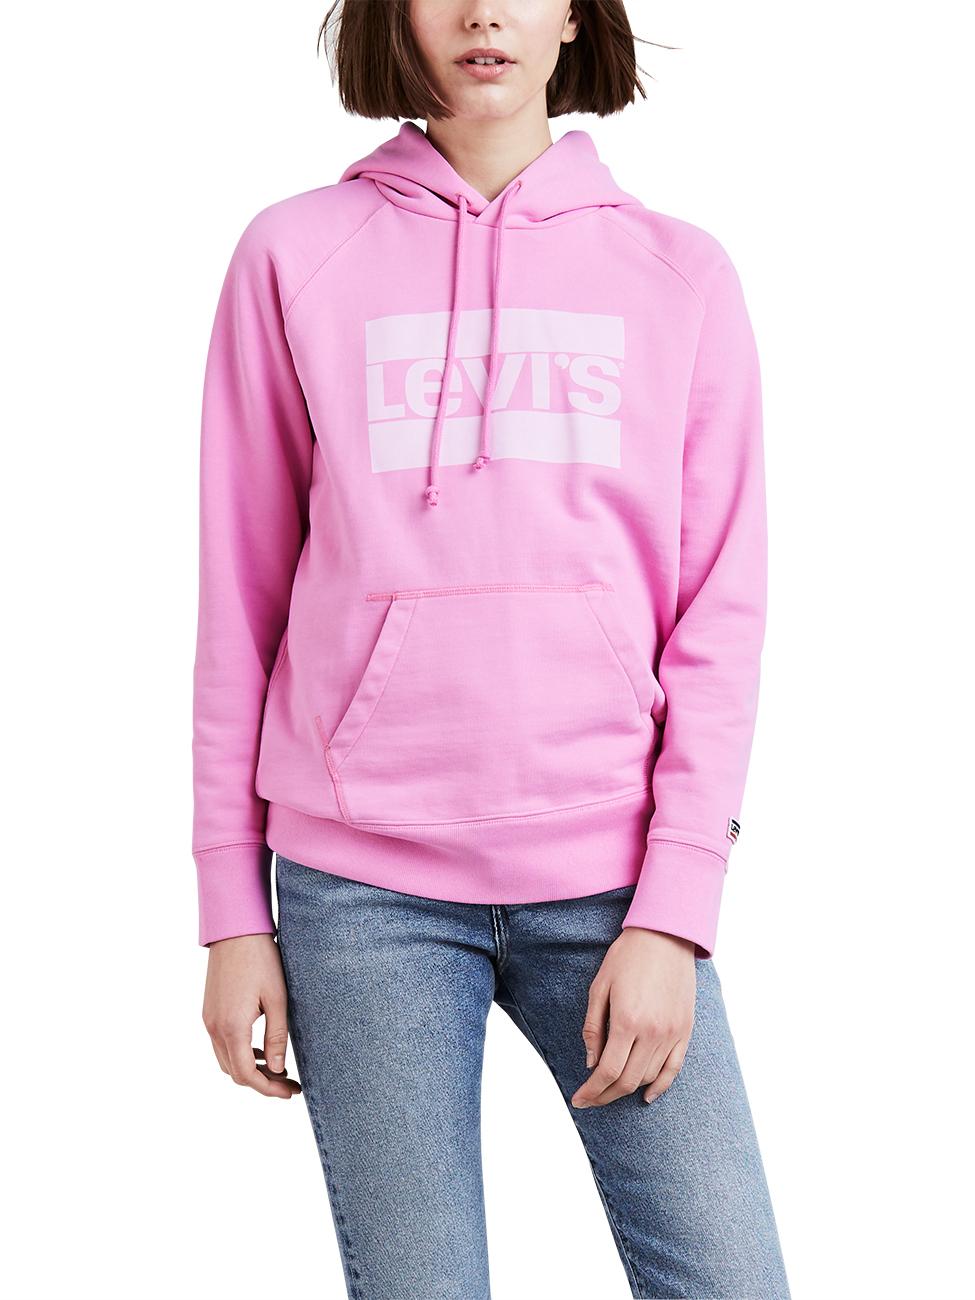 levis-damen-kapuzensweater-graphic-sport-hoodie